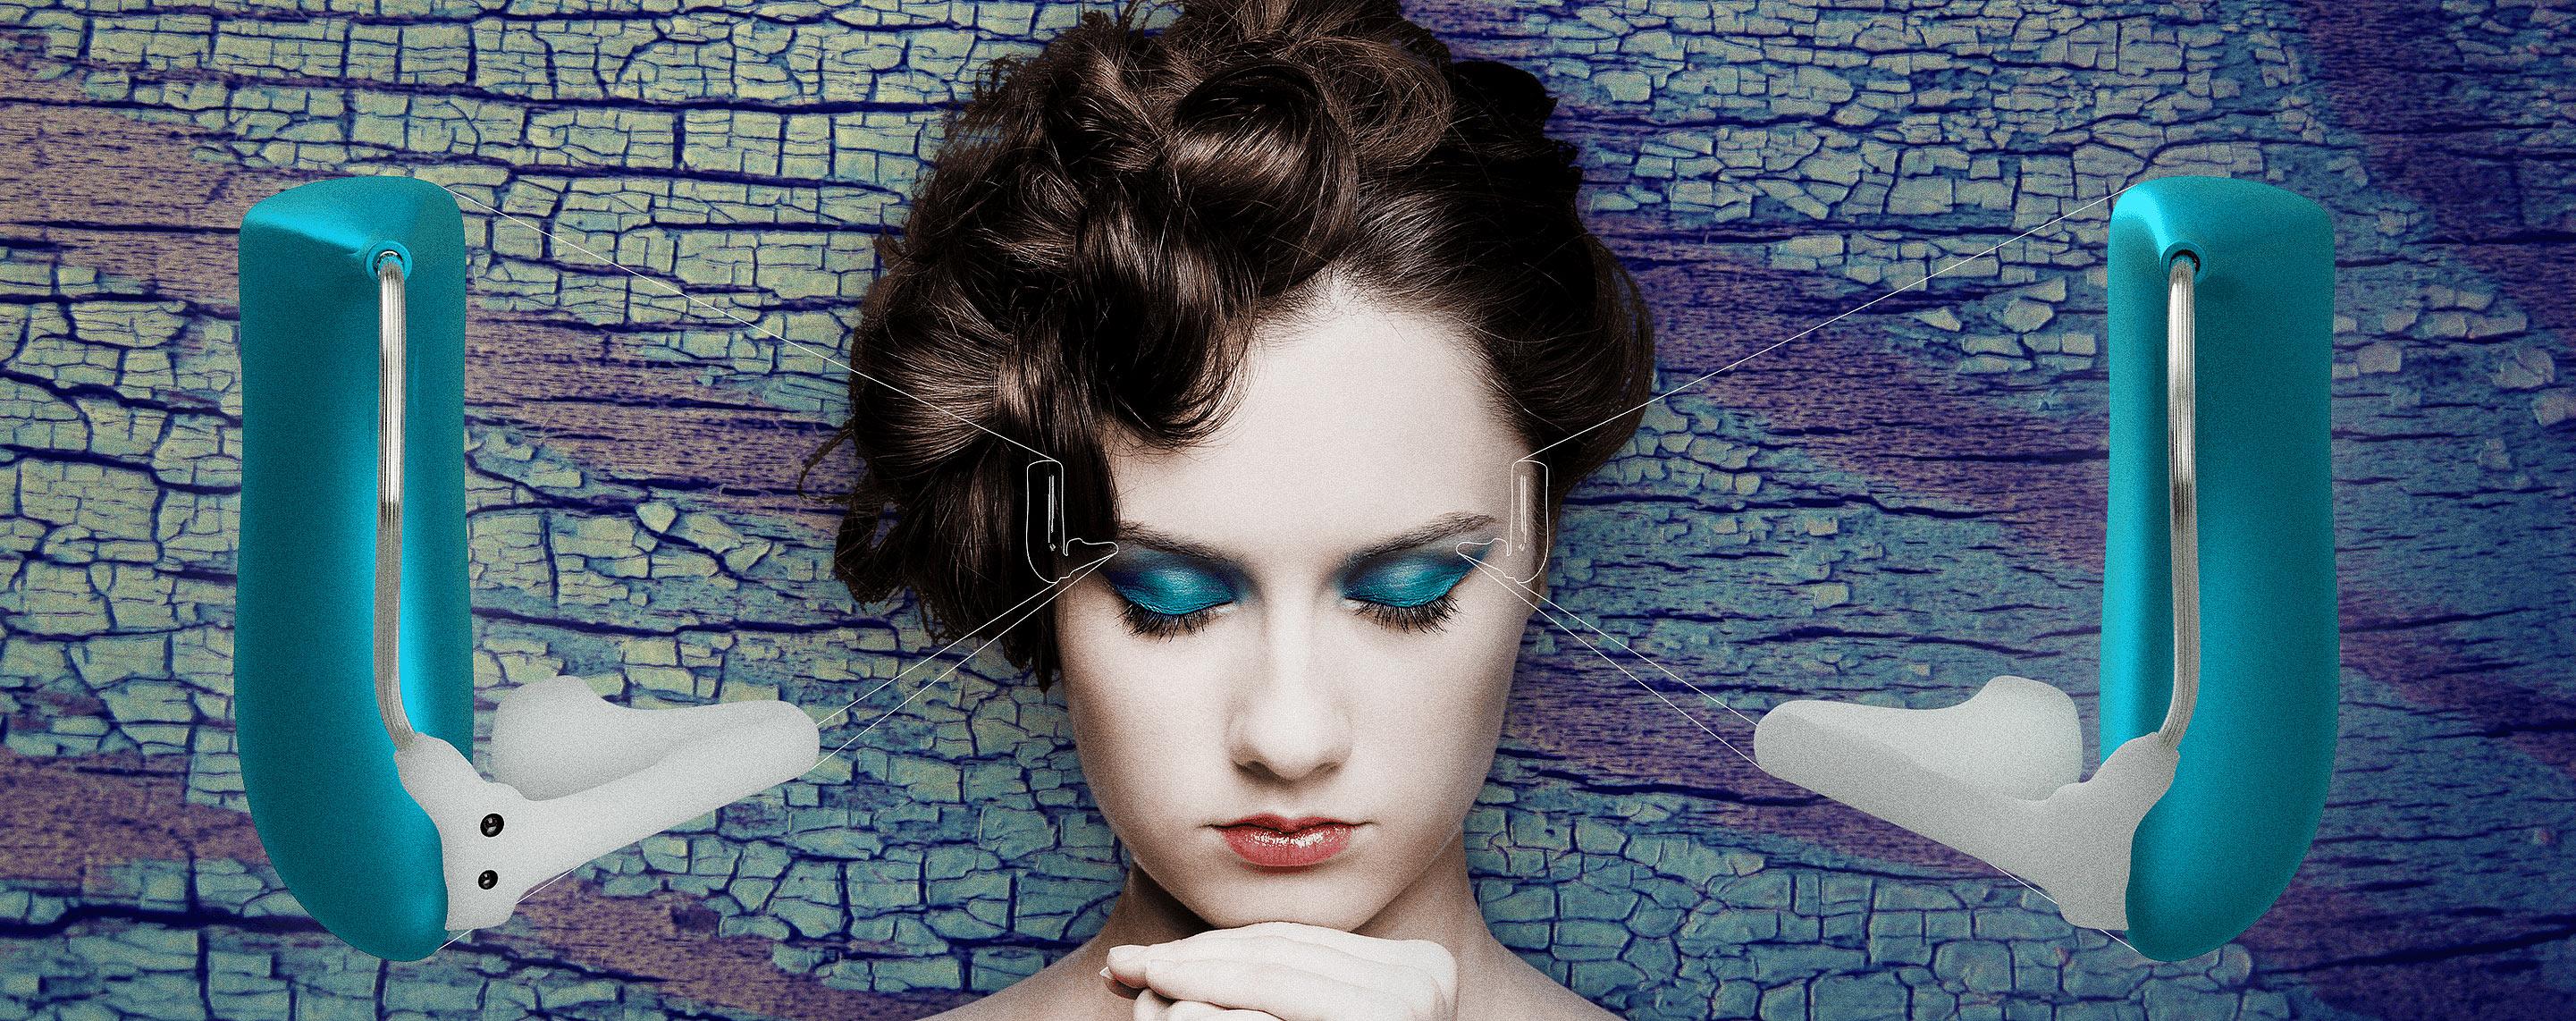 Marketing Image - Blue green